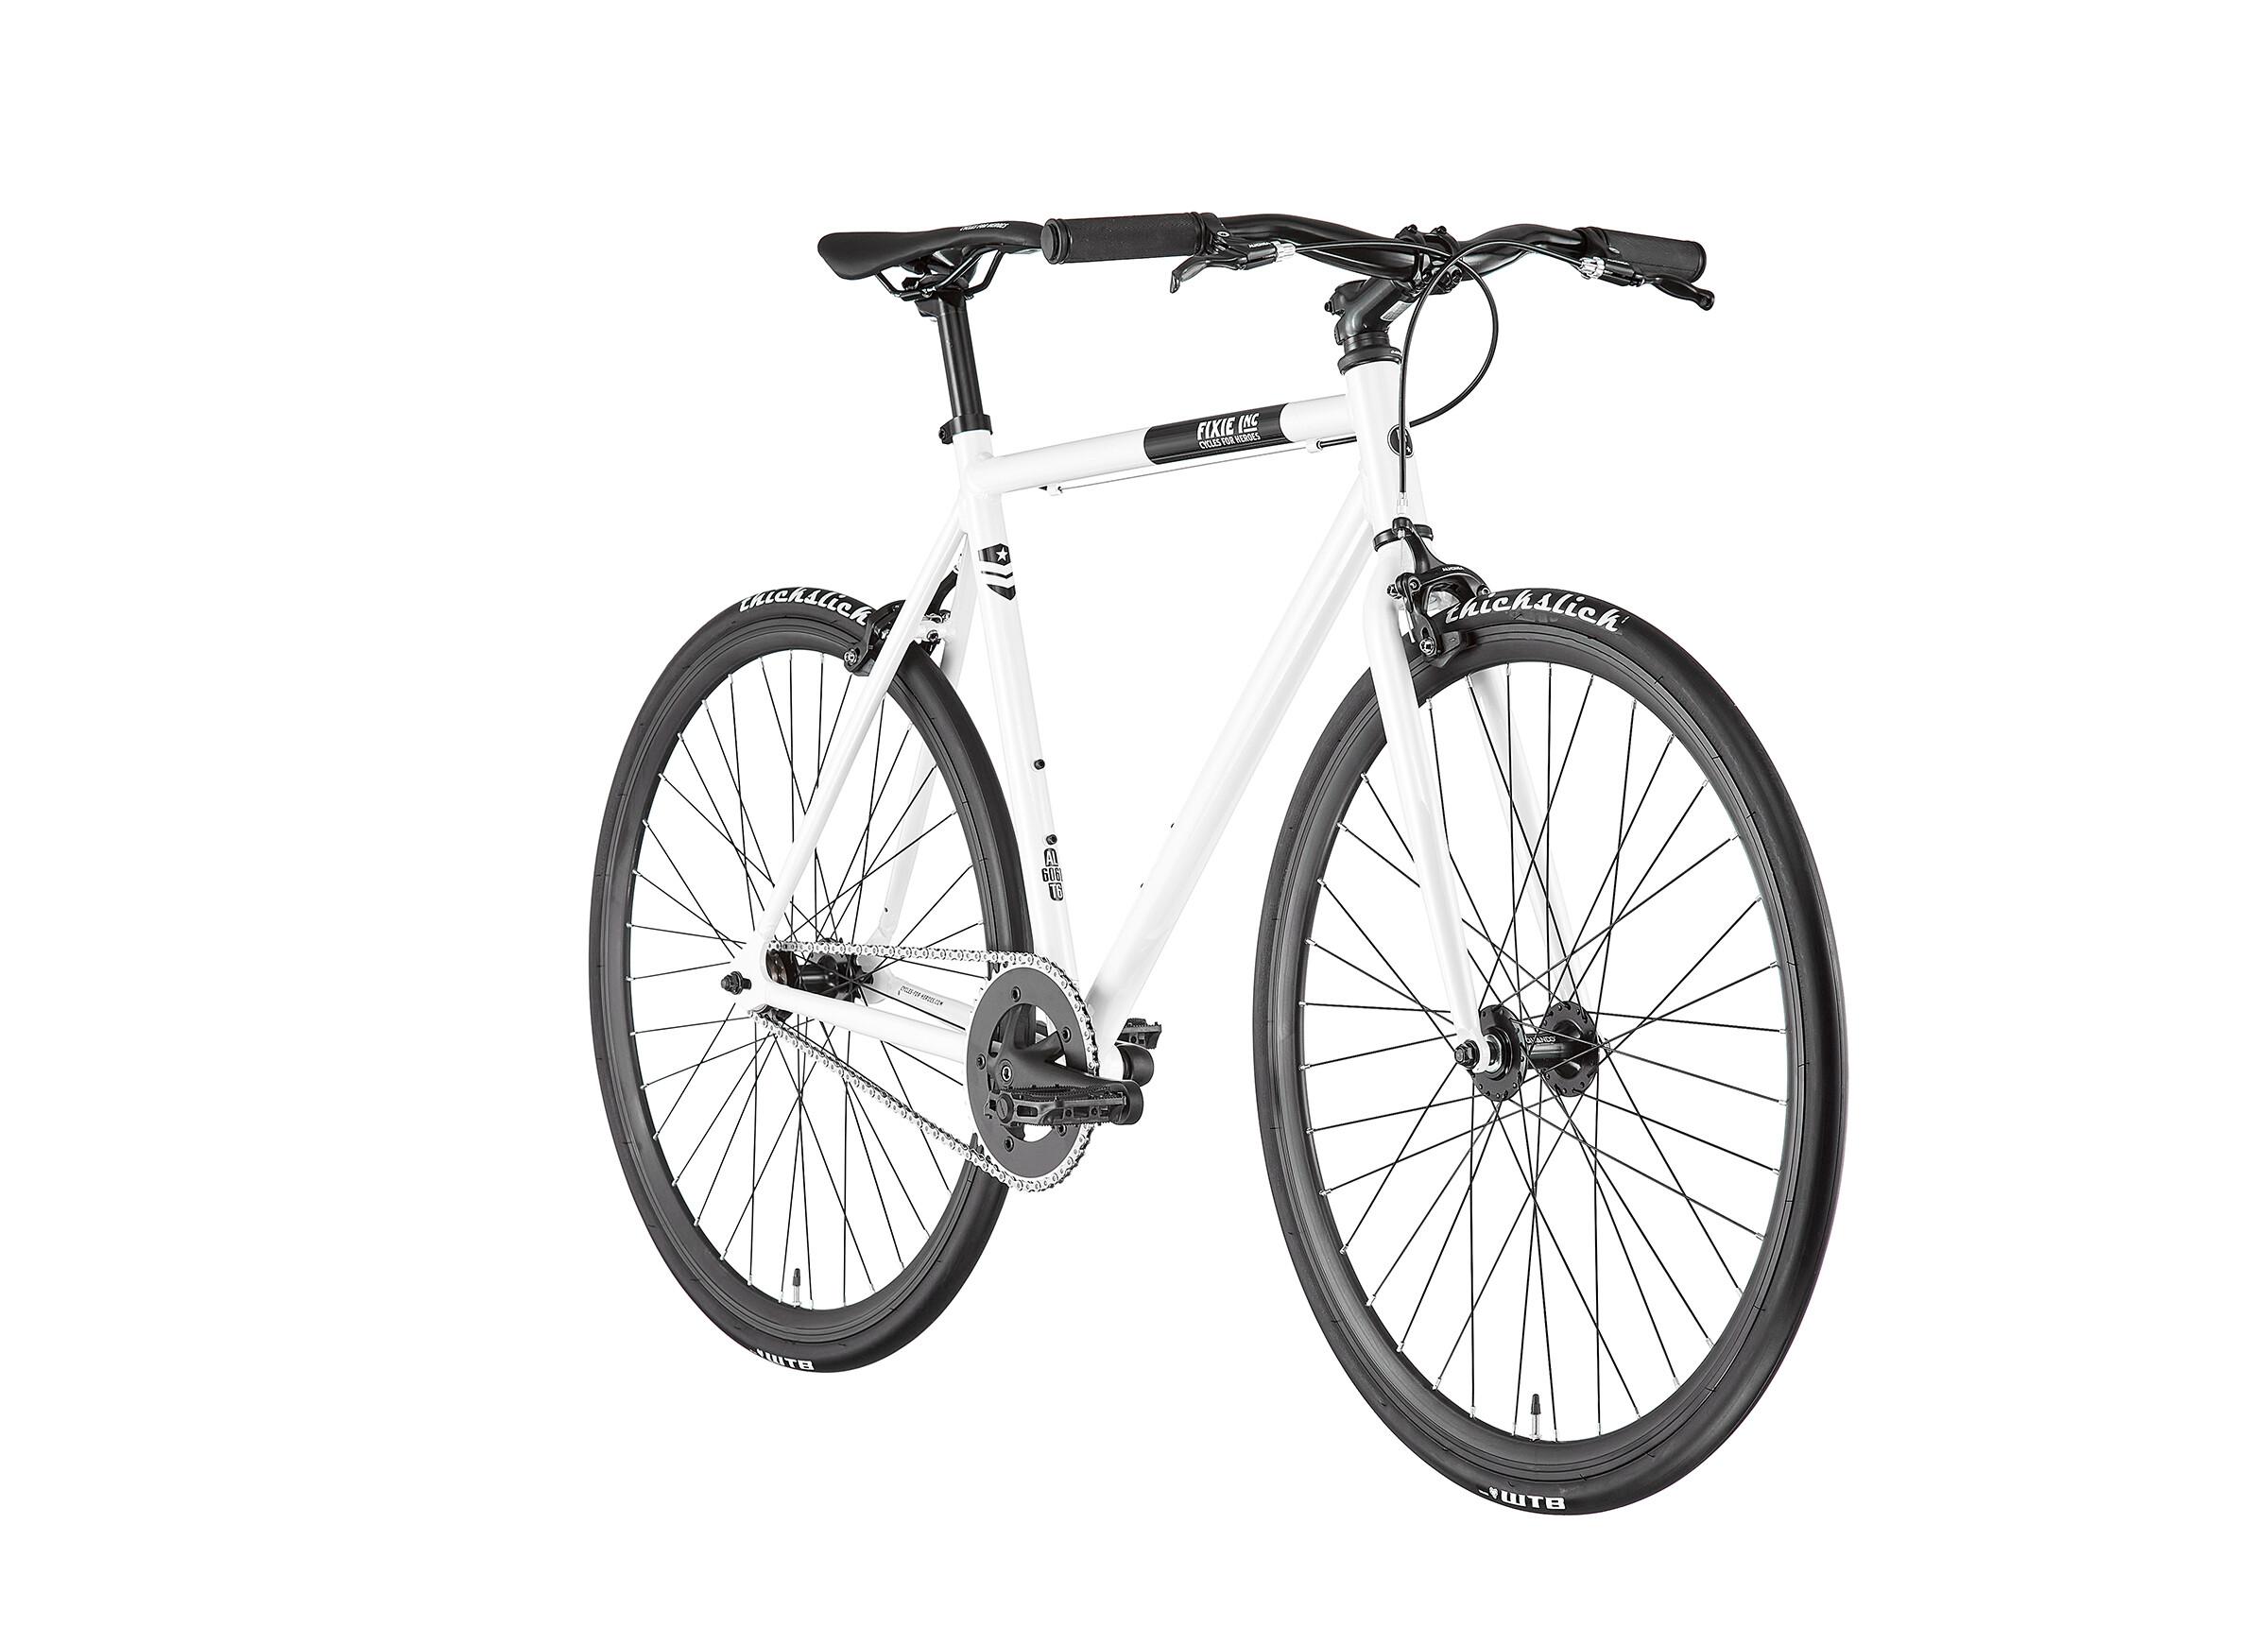 NEW LEFT LEG BICYCLE CRANK ALLOY BLACK 170 MM FOR FIXIE BIKE ROAD ETC. MTB